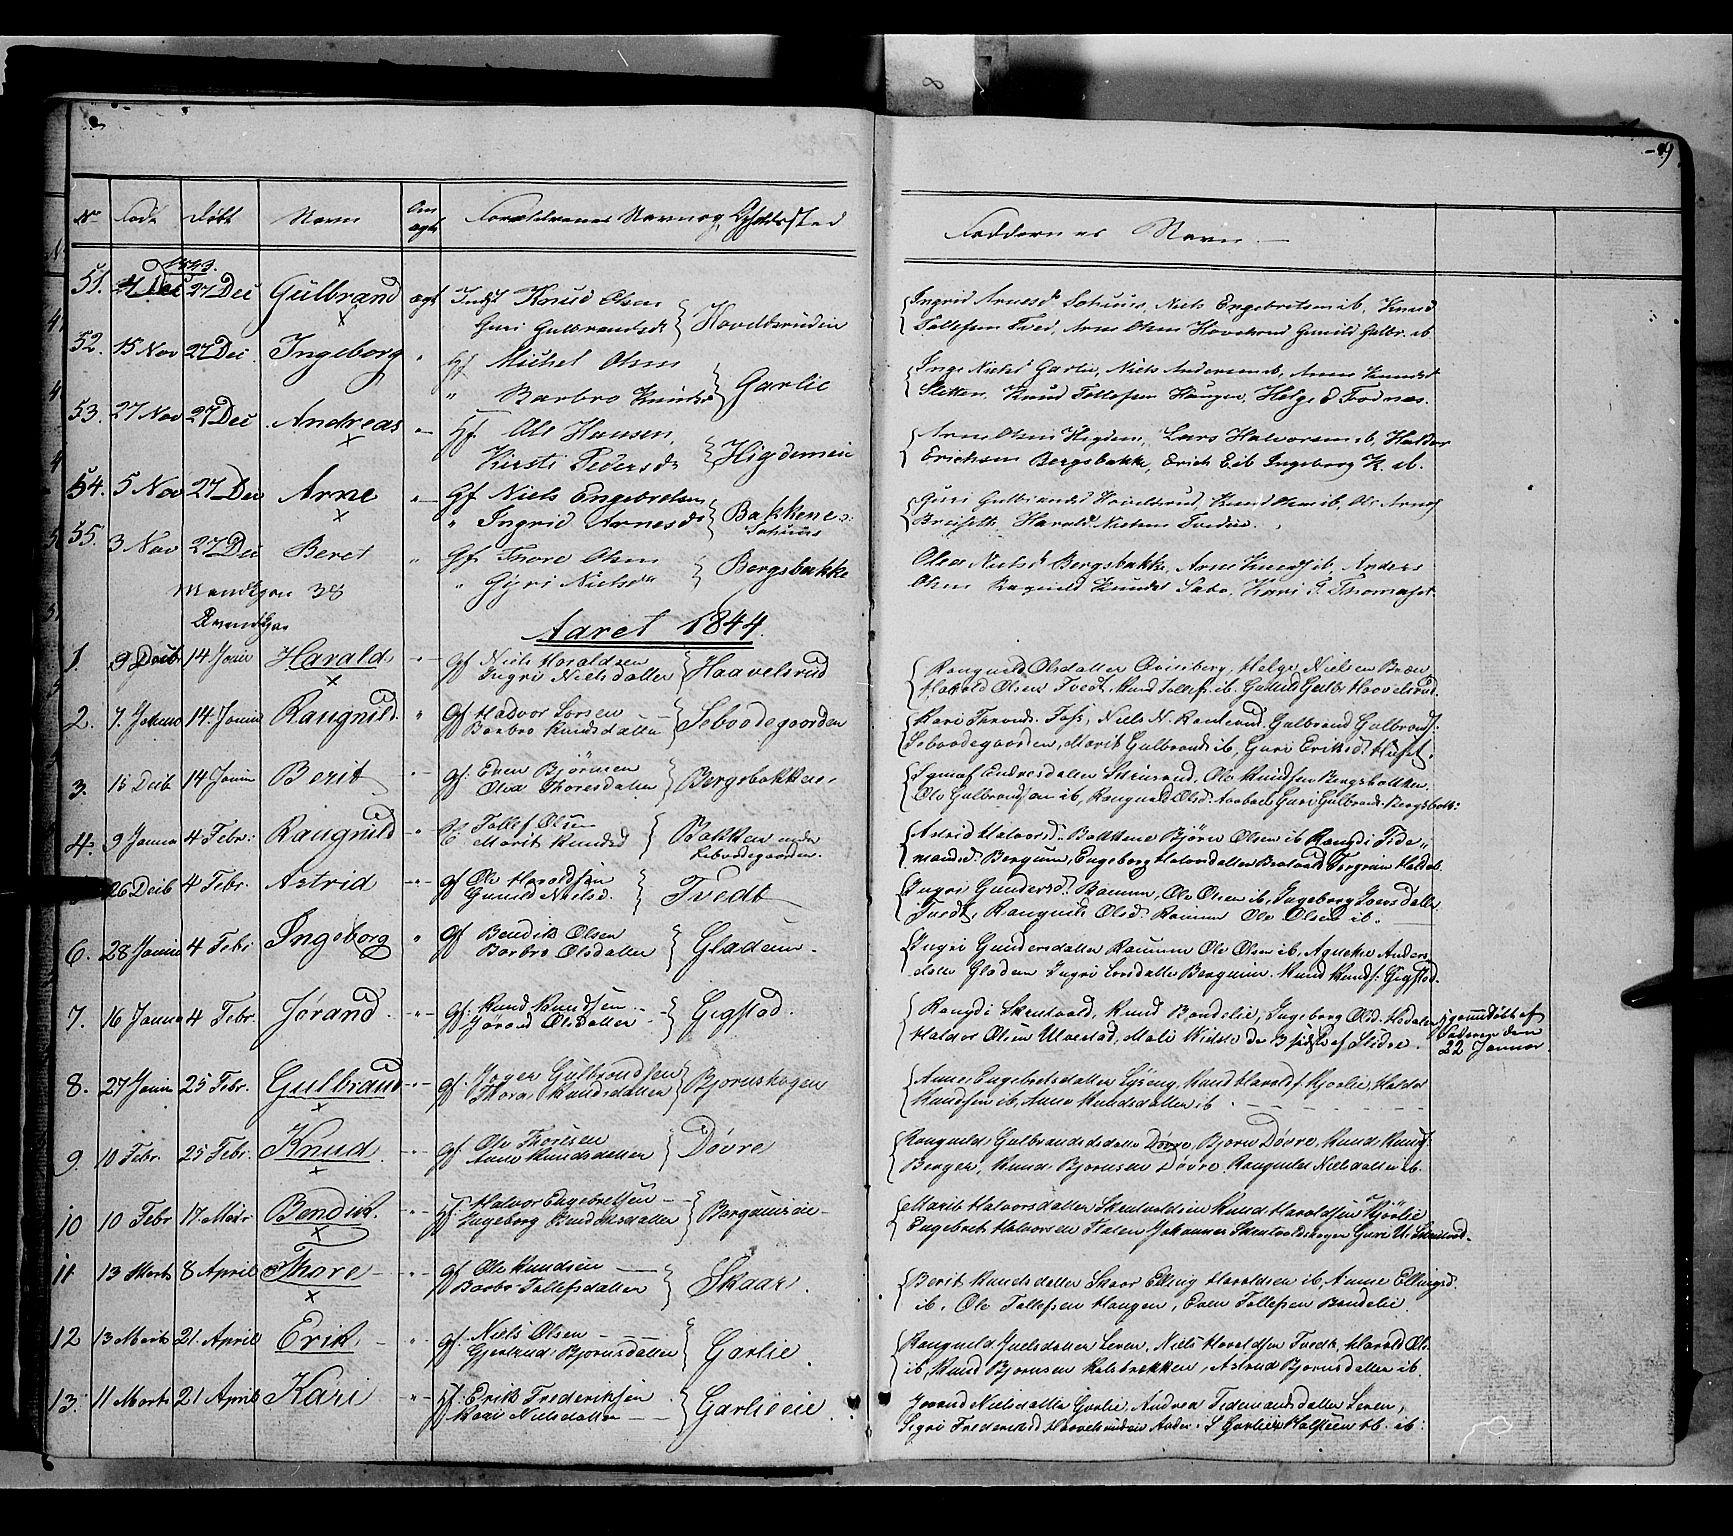 SAH, Nord-Aurdal prestekontor, Ministerialbok nr. 7, 1842-1863, s. 9